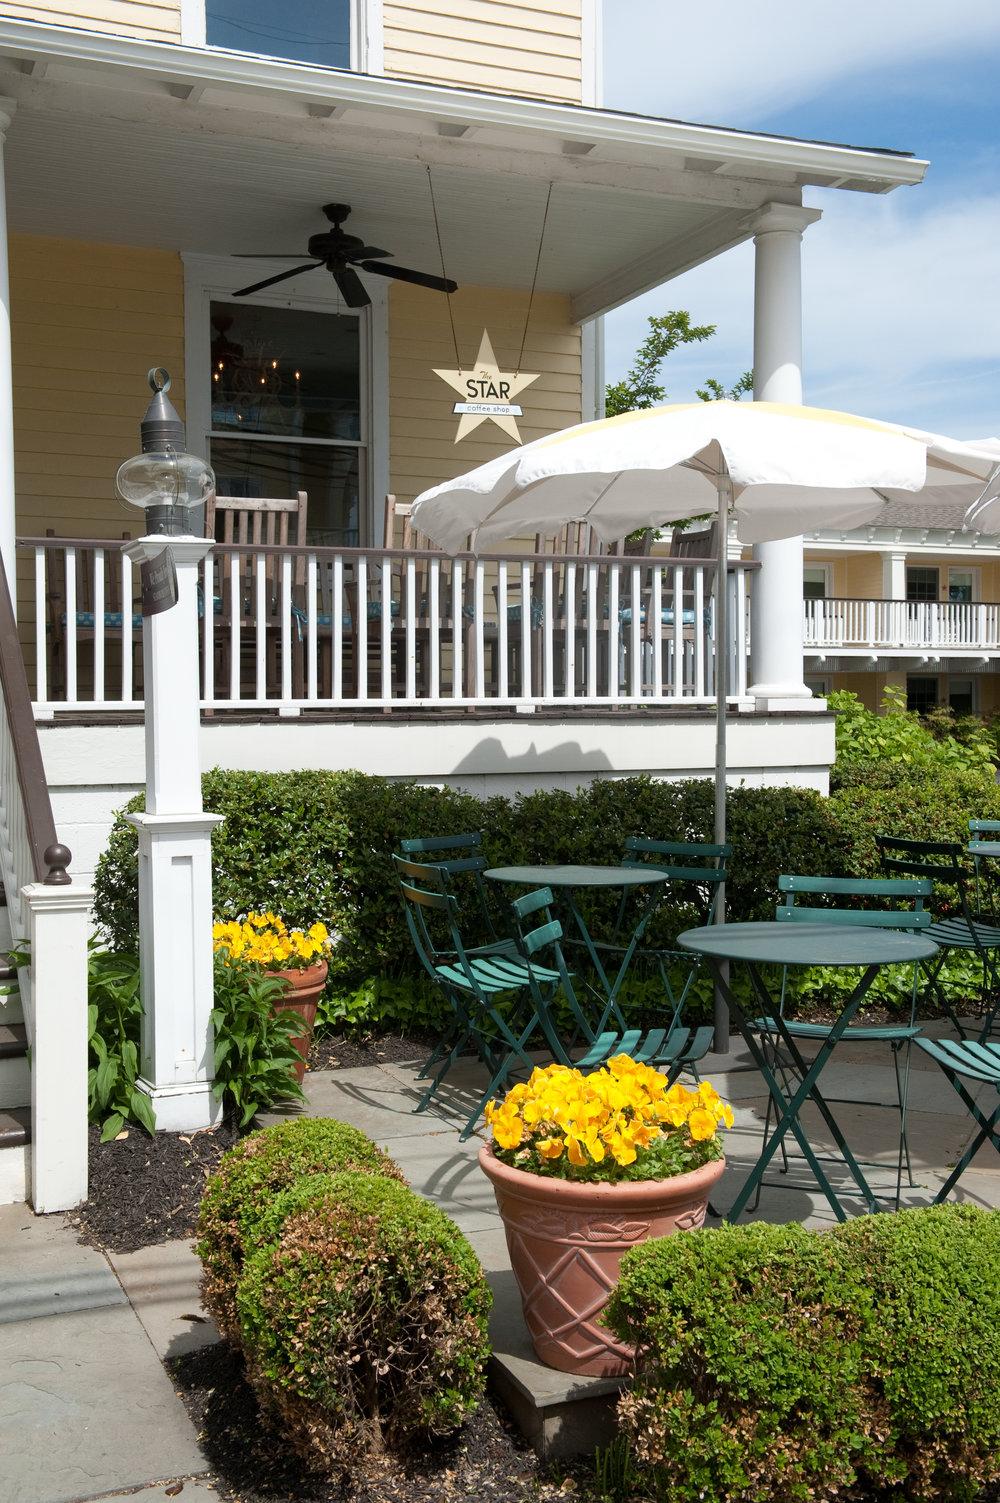 05_Star Inn.jpg